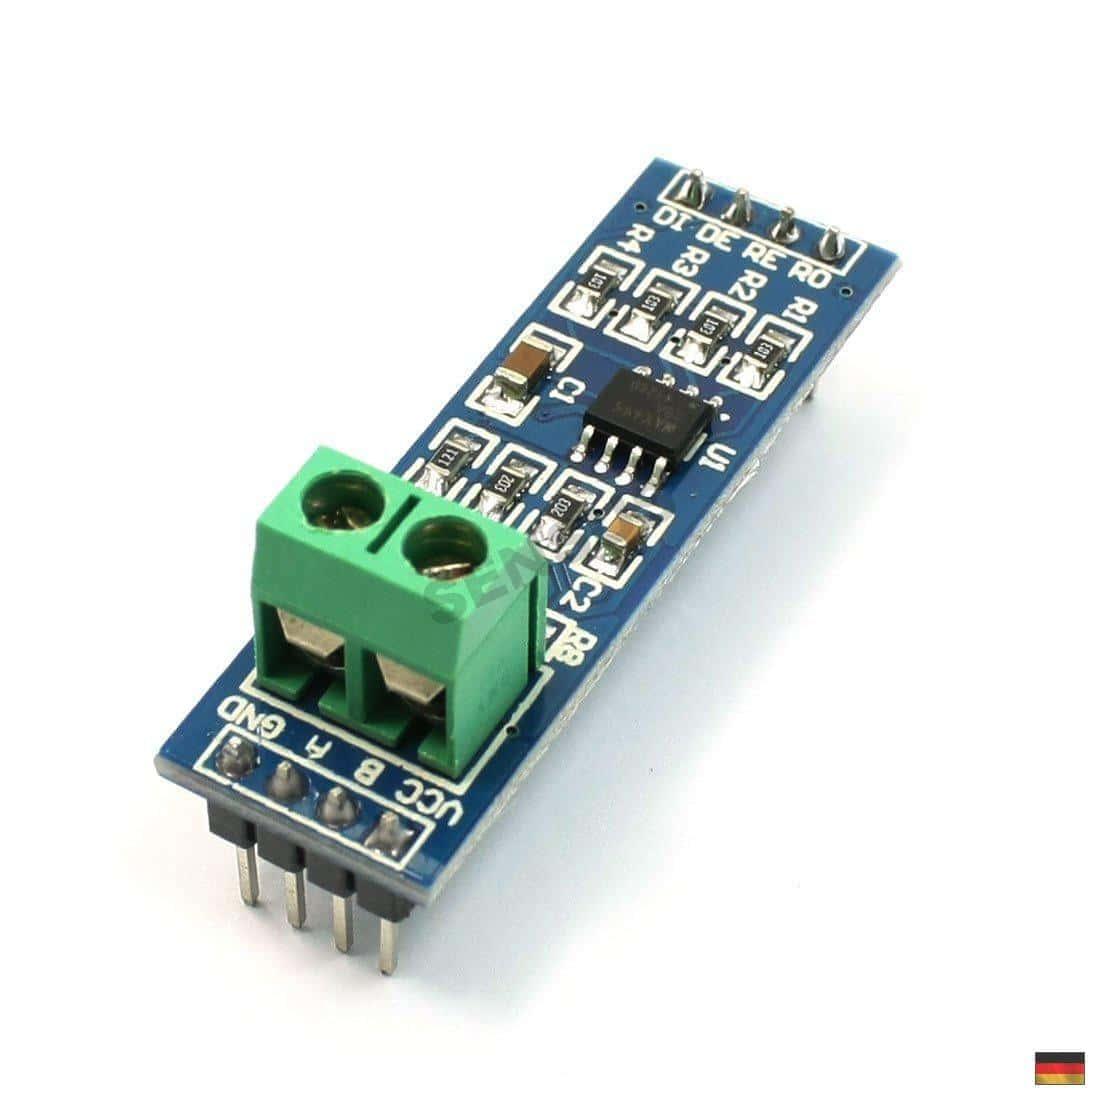 ttl rs 485 konverter modul max485 adapter bus modbus. Black Bedroom Furniture Sets. Home Design Ideas